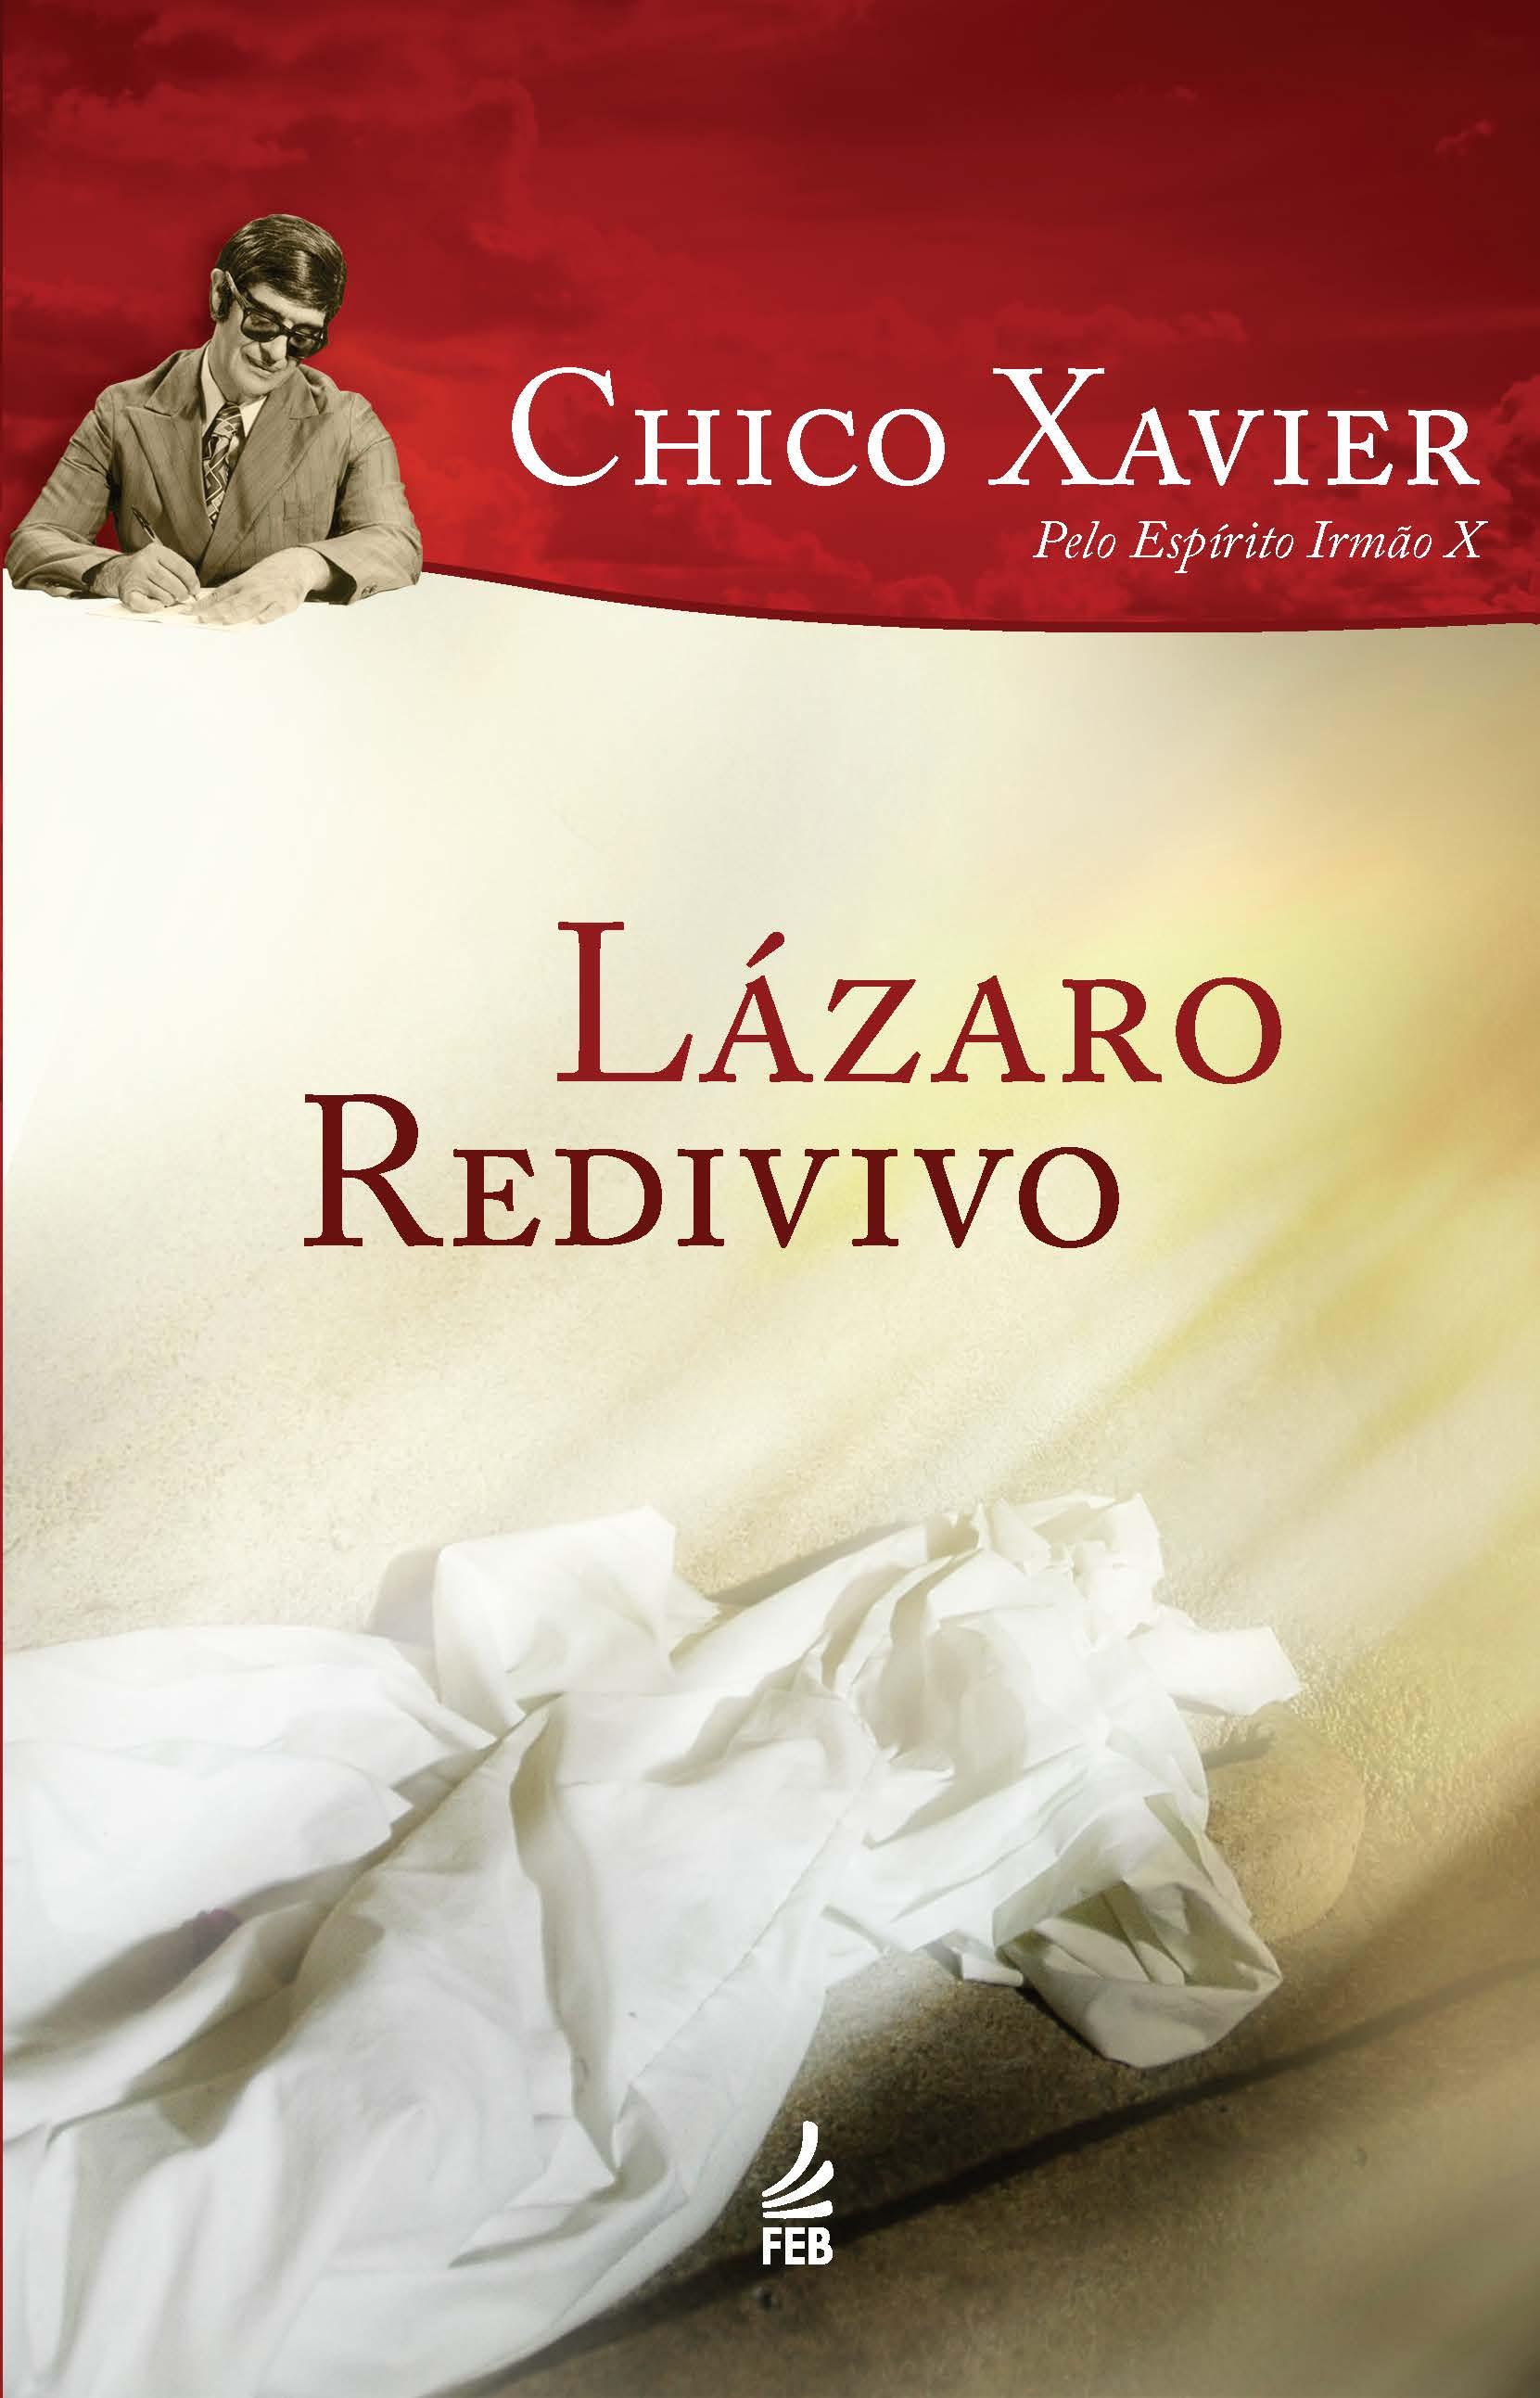 lazaro-redivivo-1416843886__105869